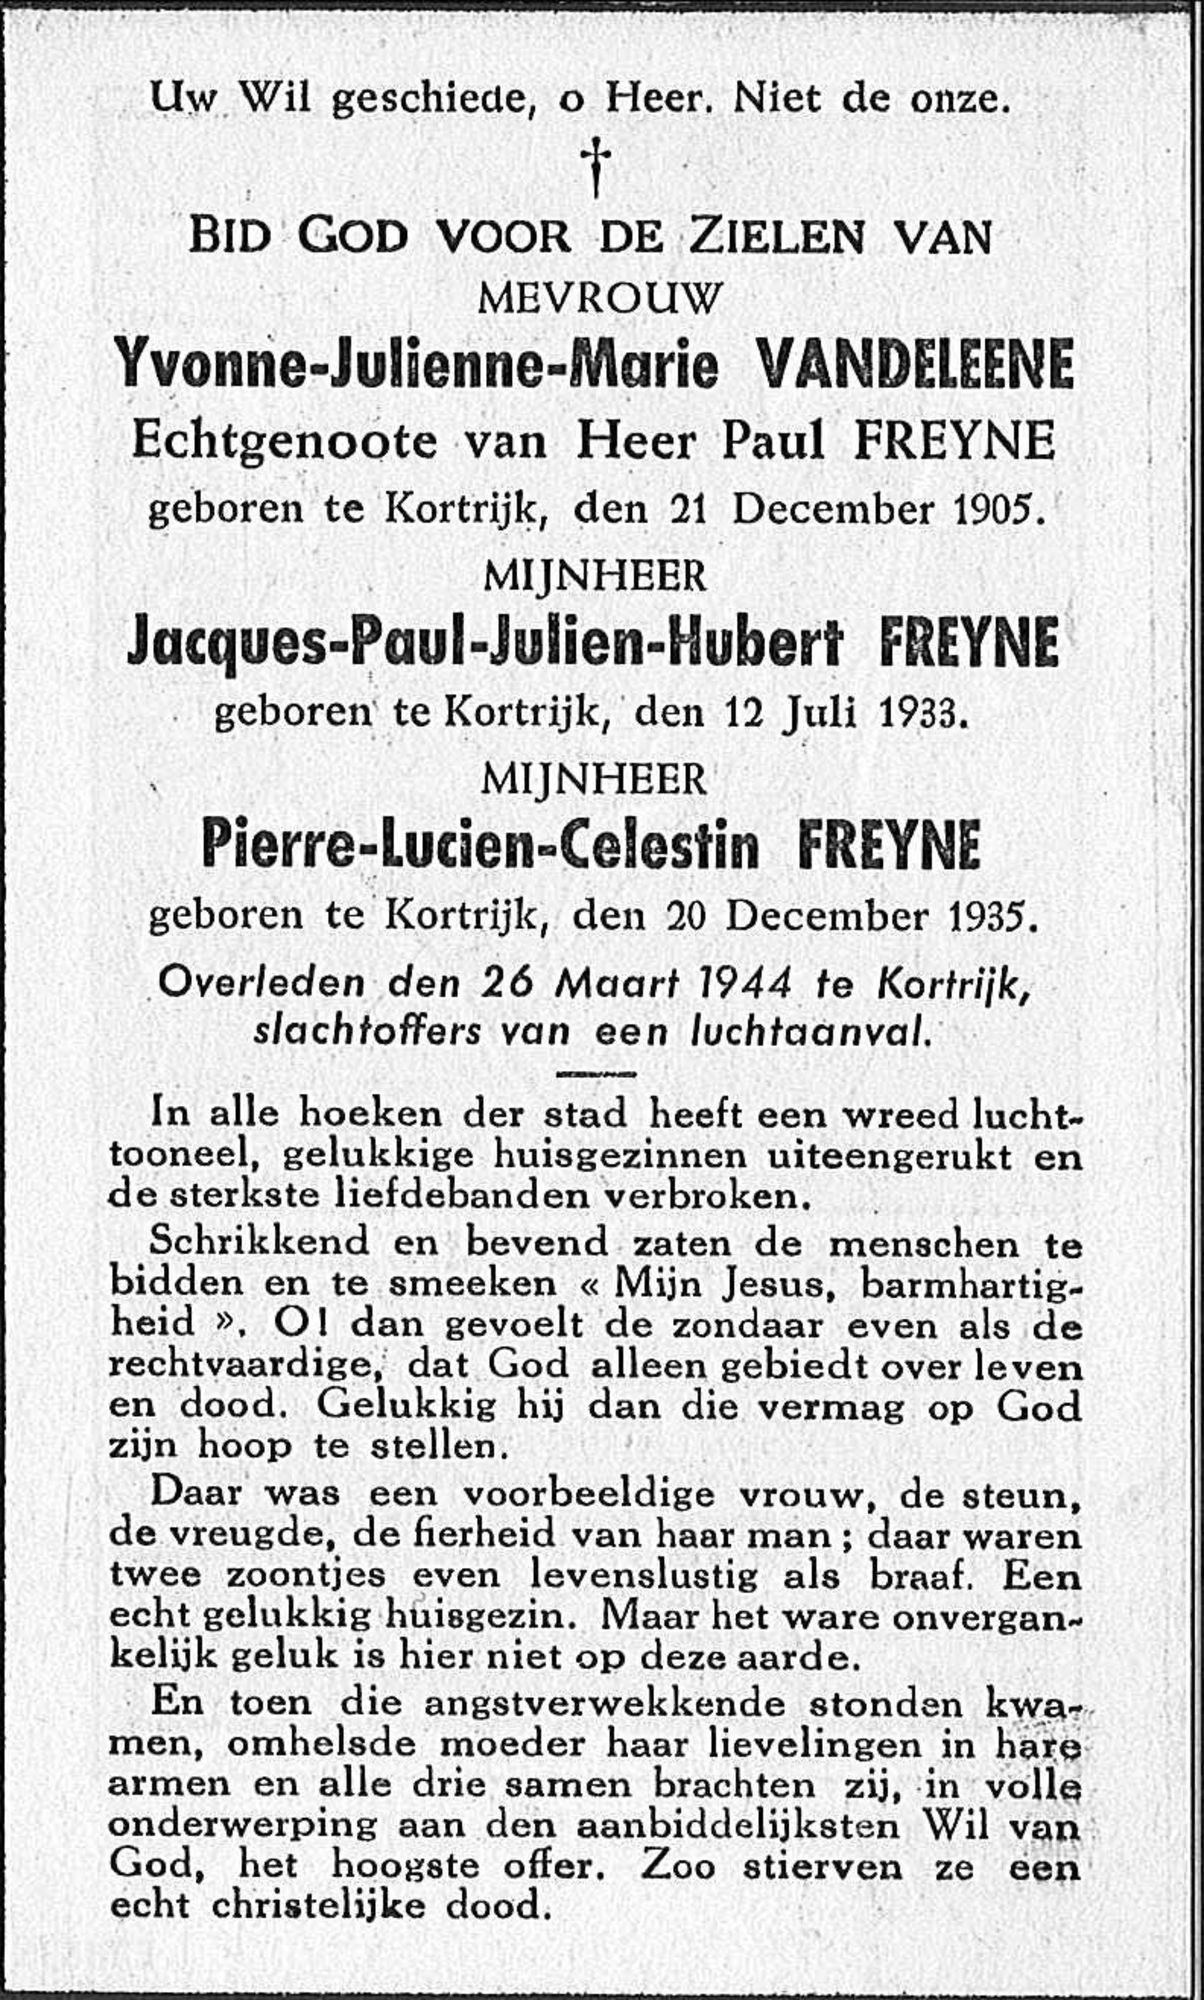 Pierre-Lucien-Celestin Freyne